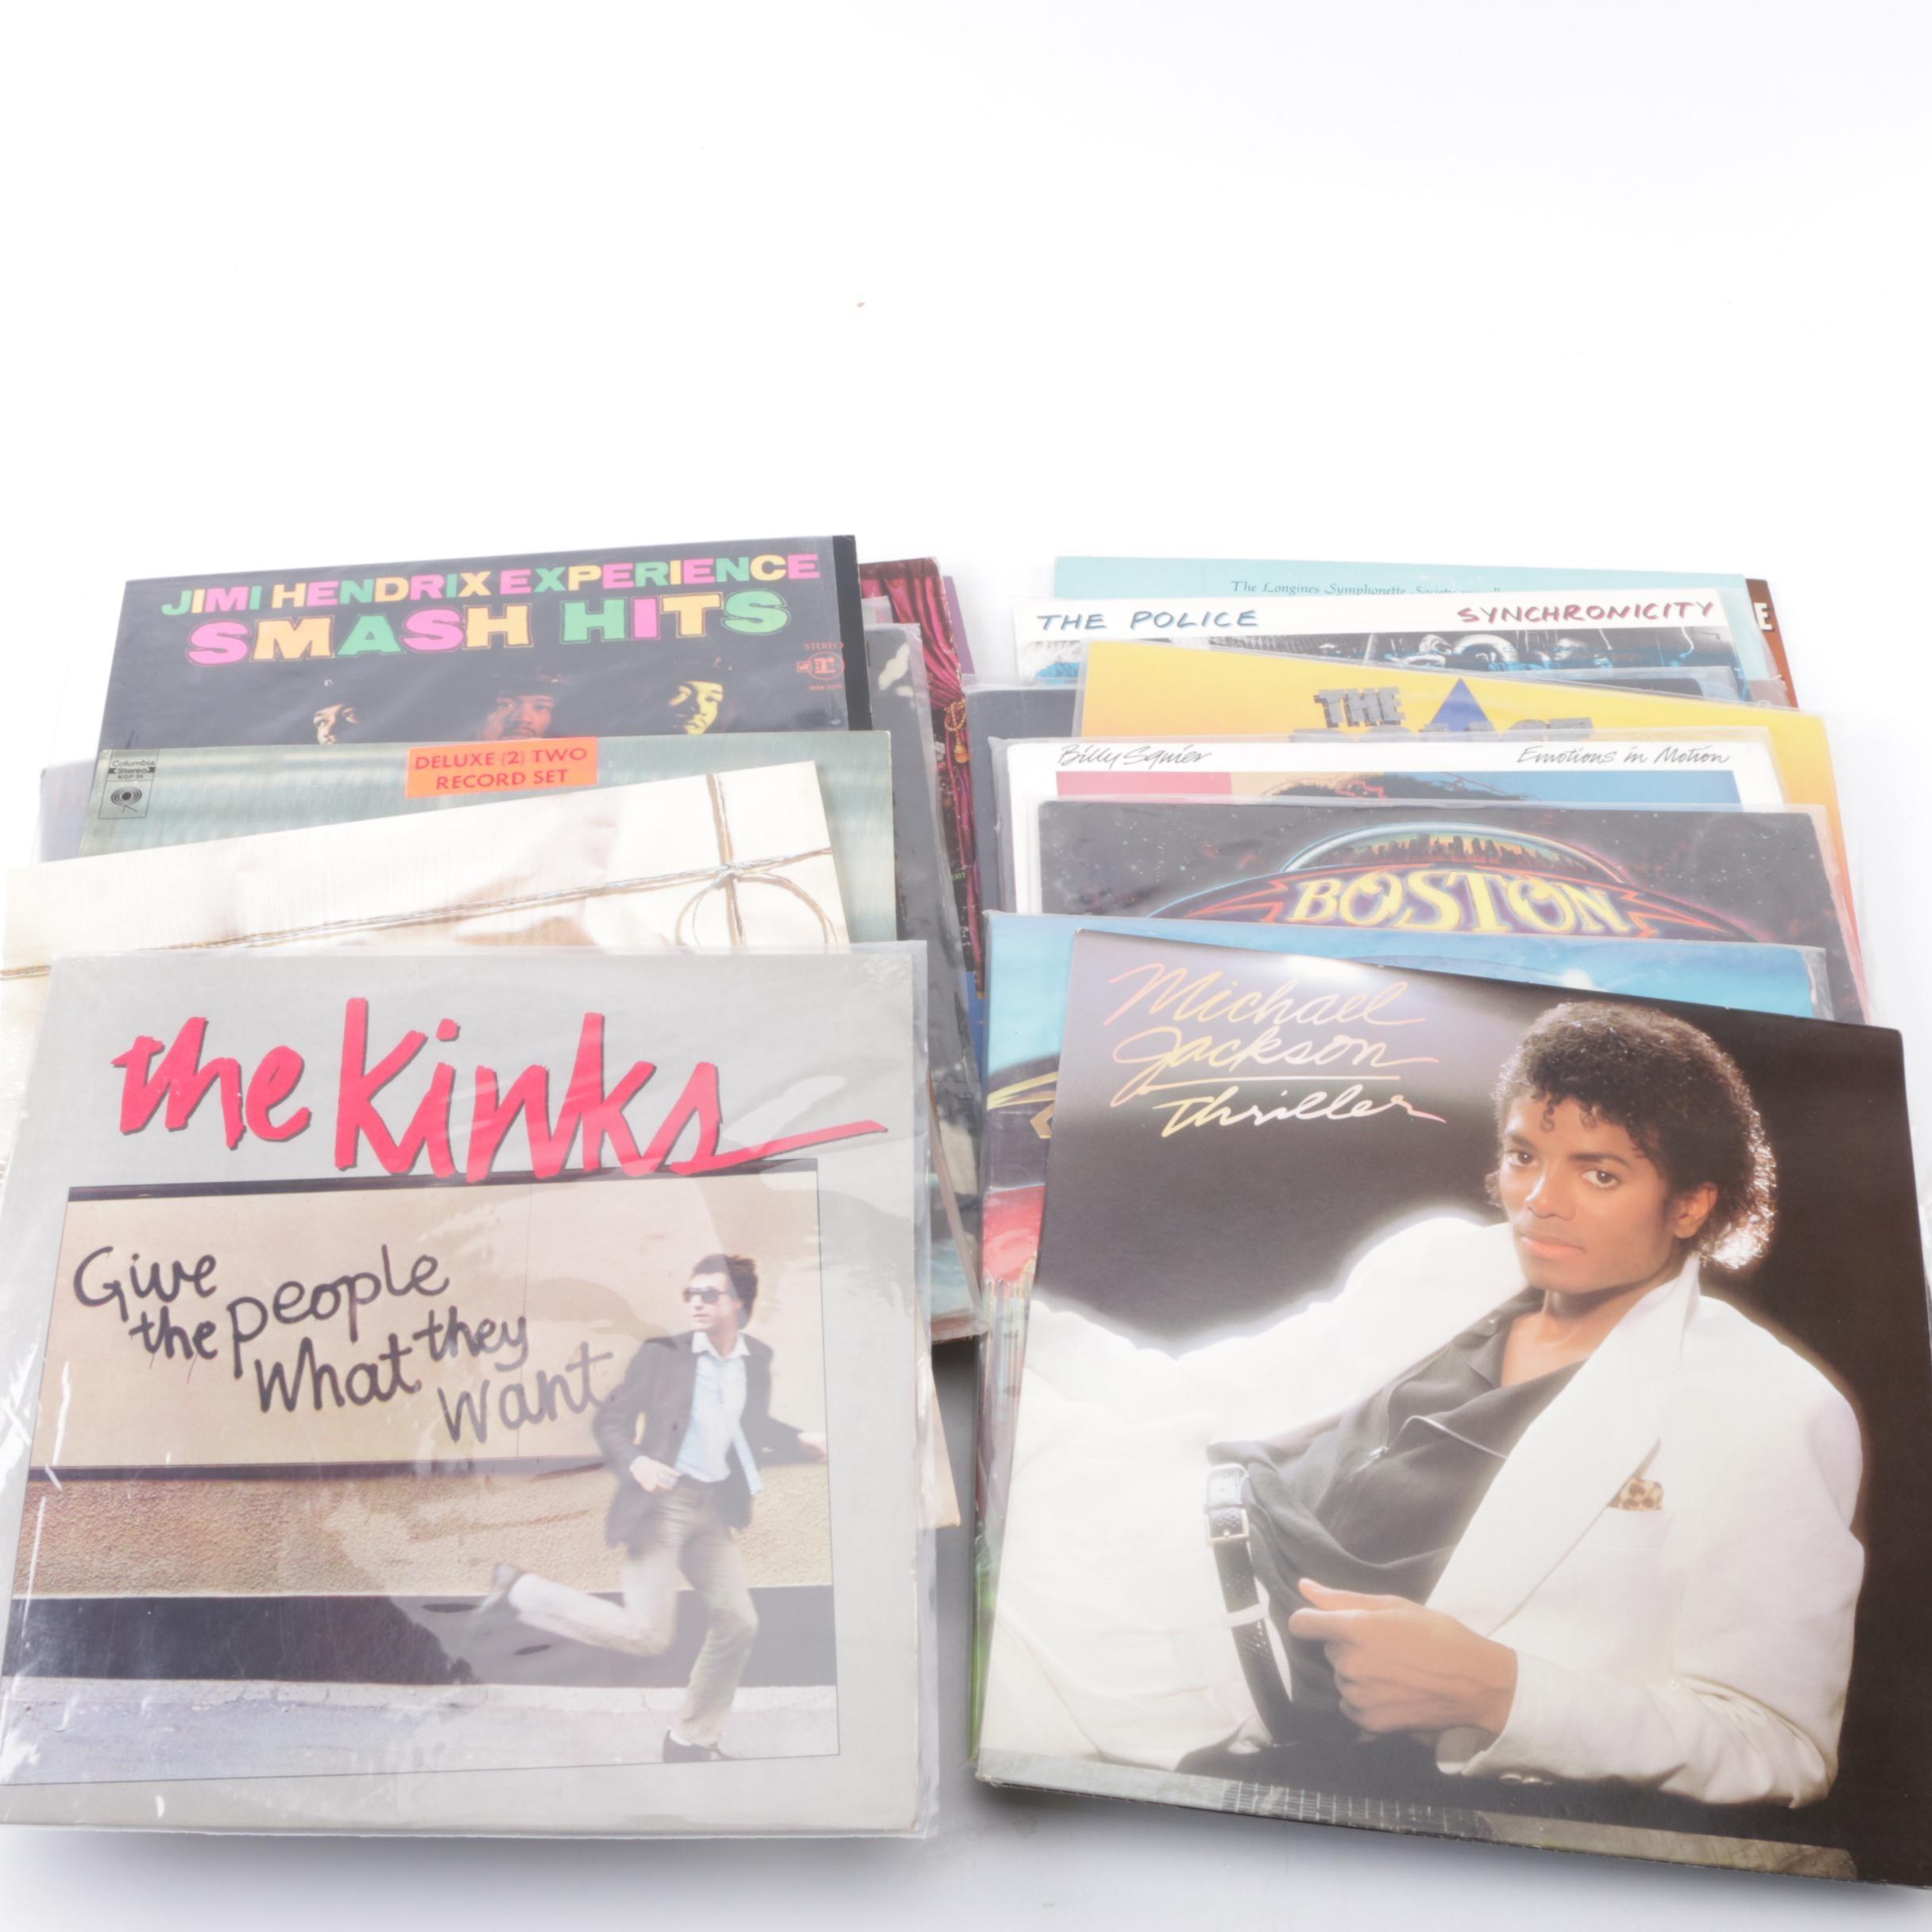 Kinks, Michael Jackson, Hendrix and Other LPs